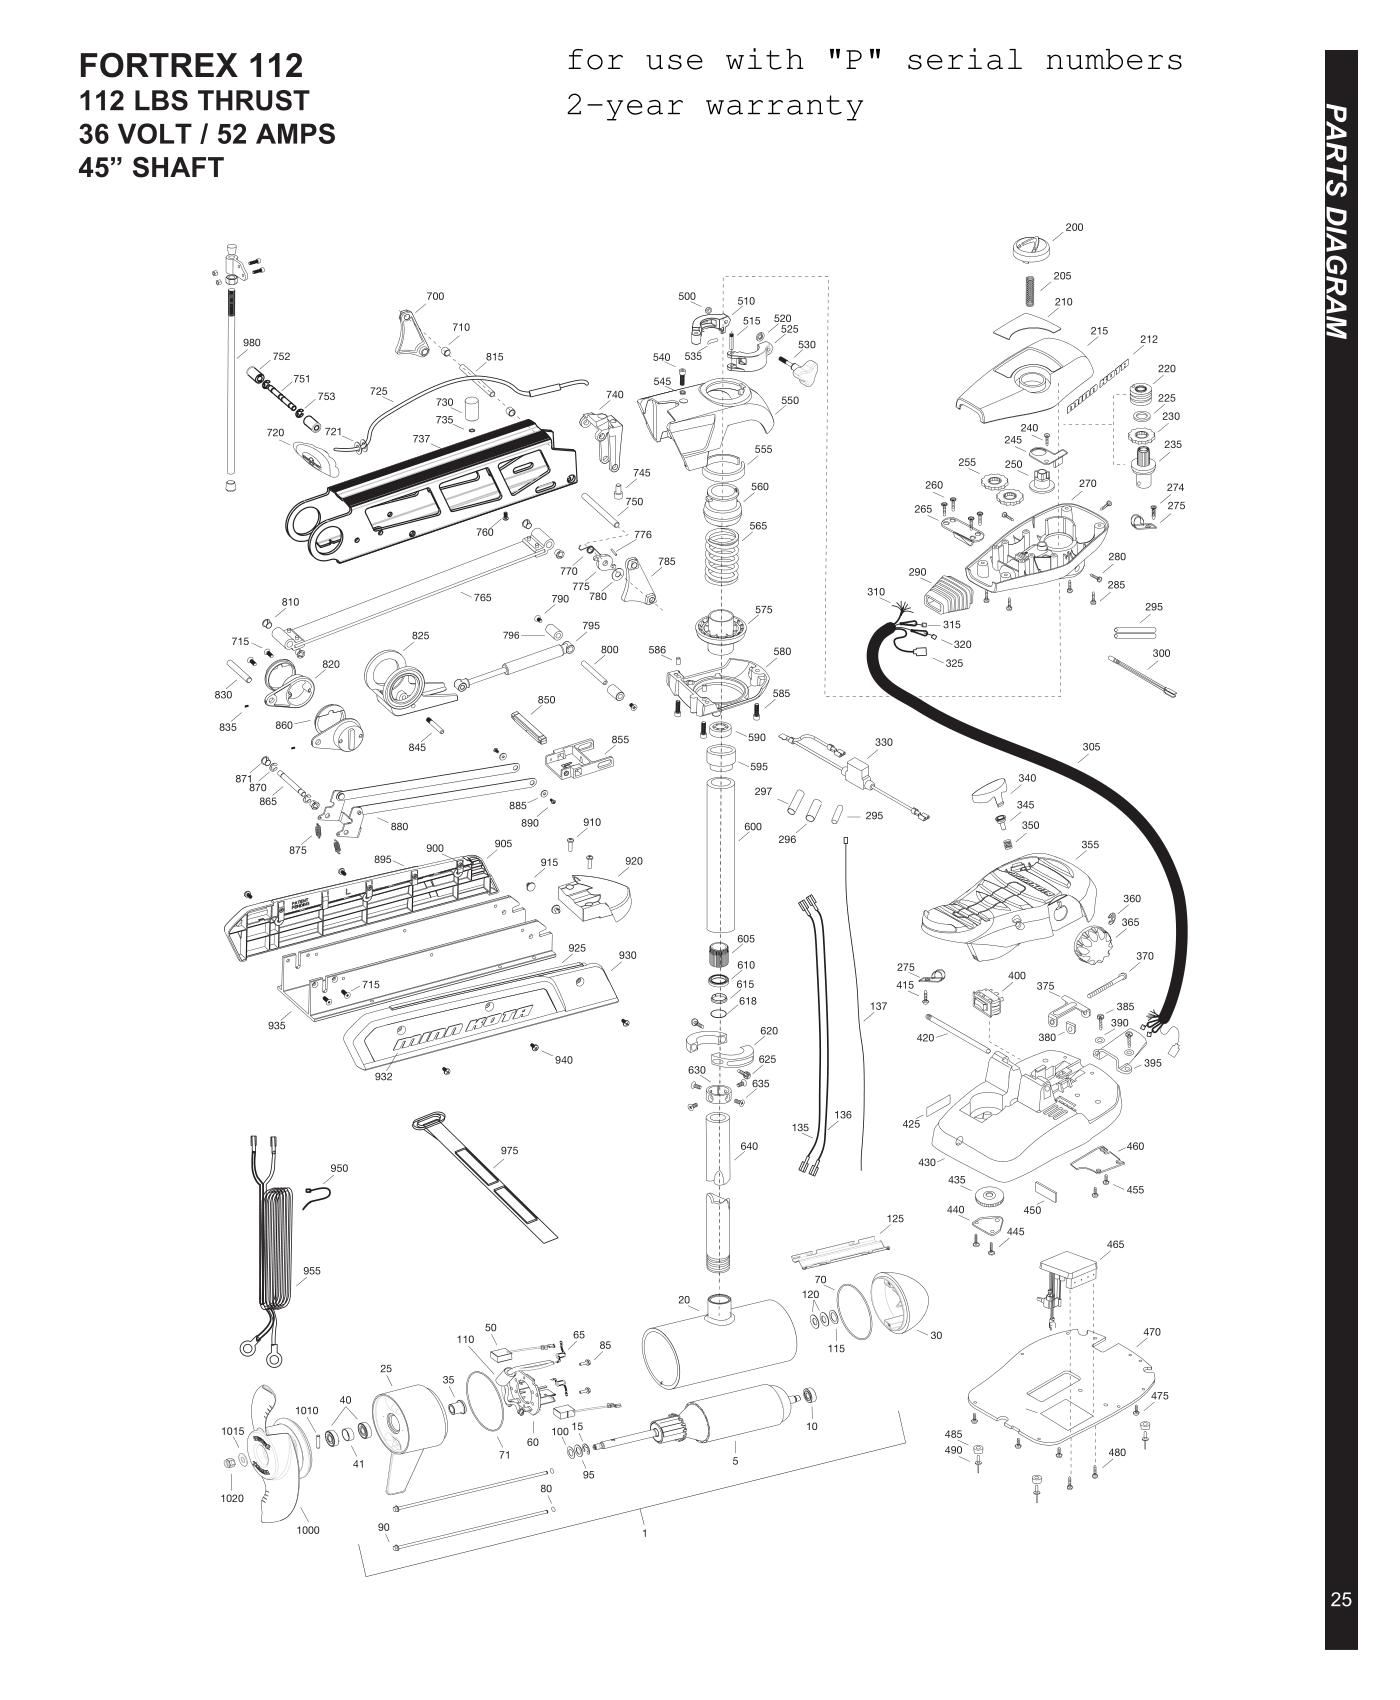 2015 mk fortrex112 45inch 1 minn kota fortrex 112 (45 inch) parts 2015 from fish307 com